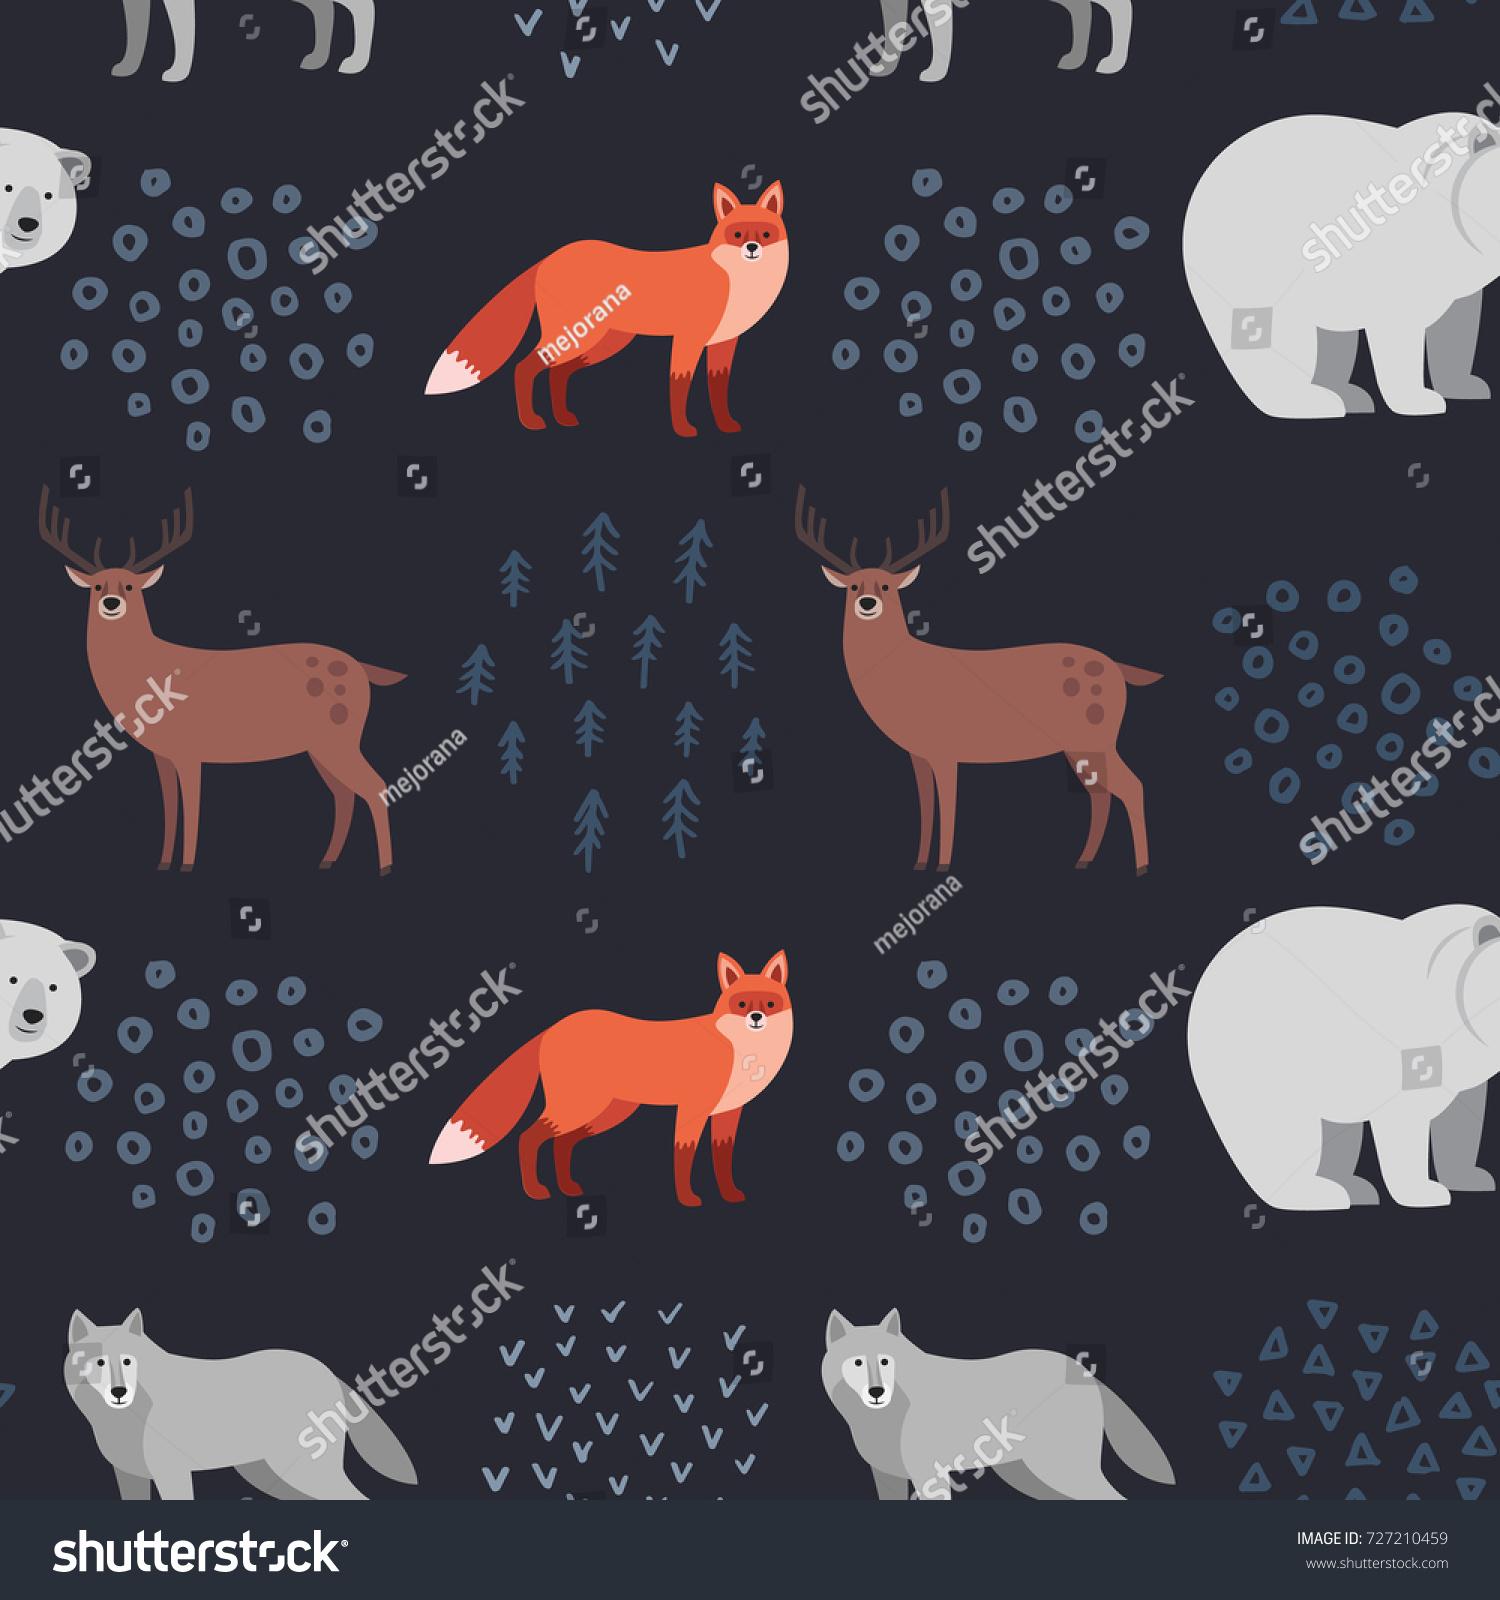 Seamless Handdrawn Pattern Forest Animals Fox Stock Vector